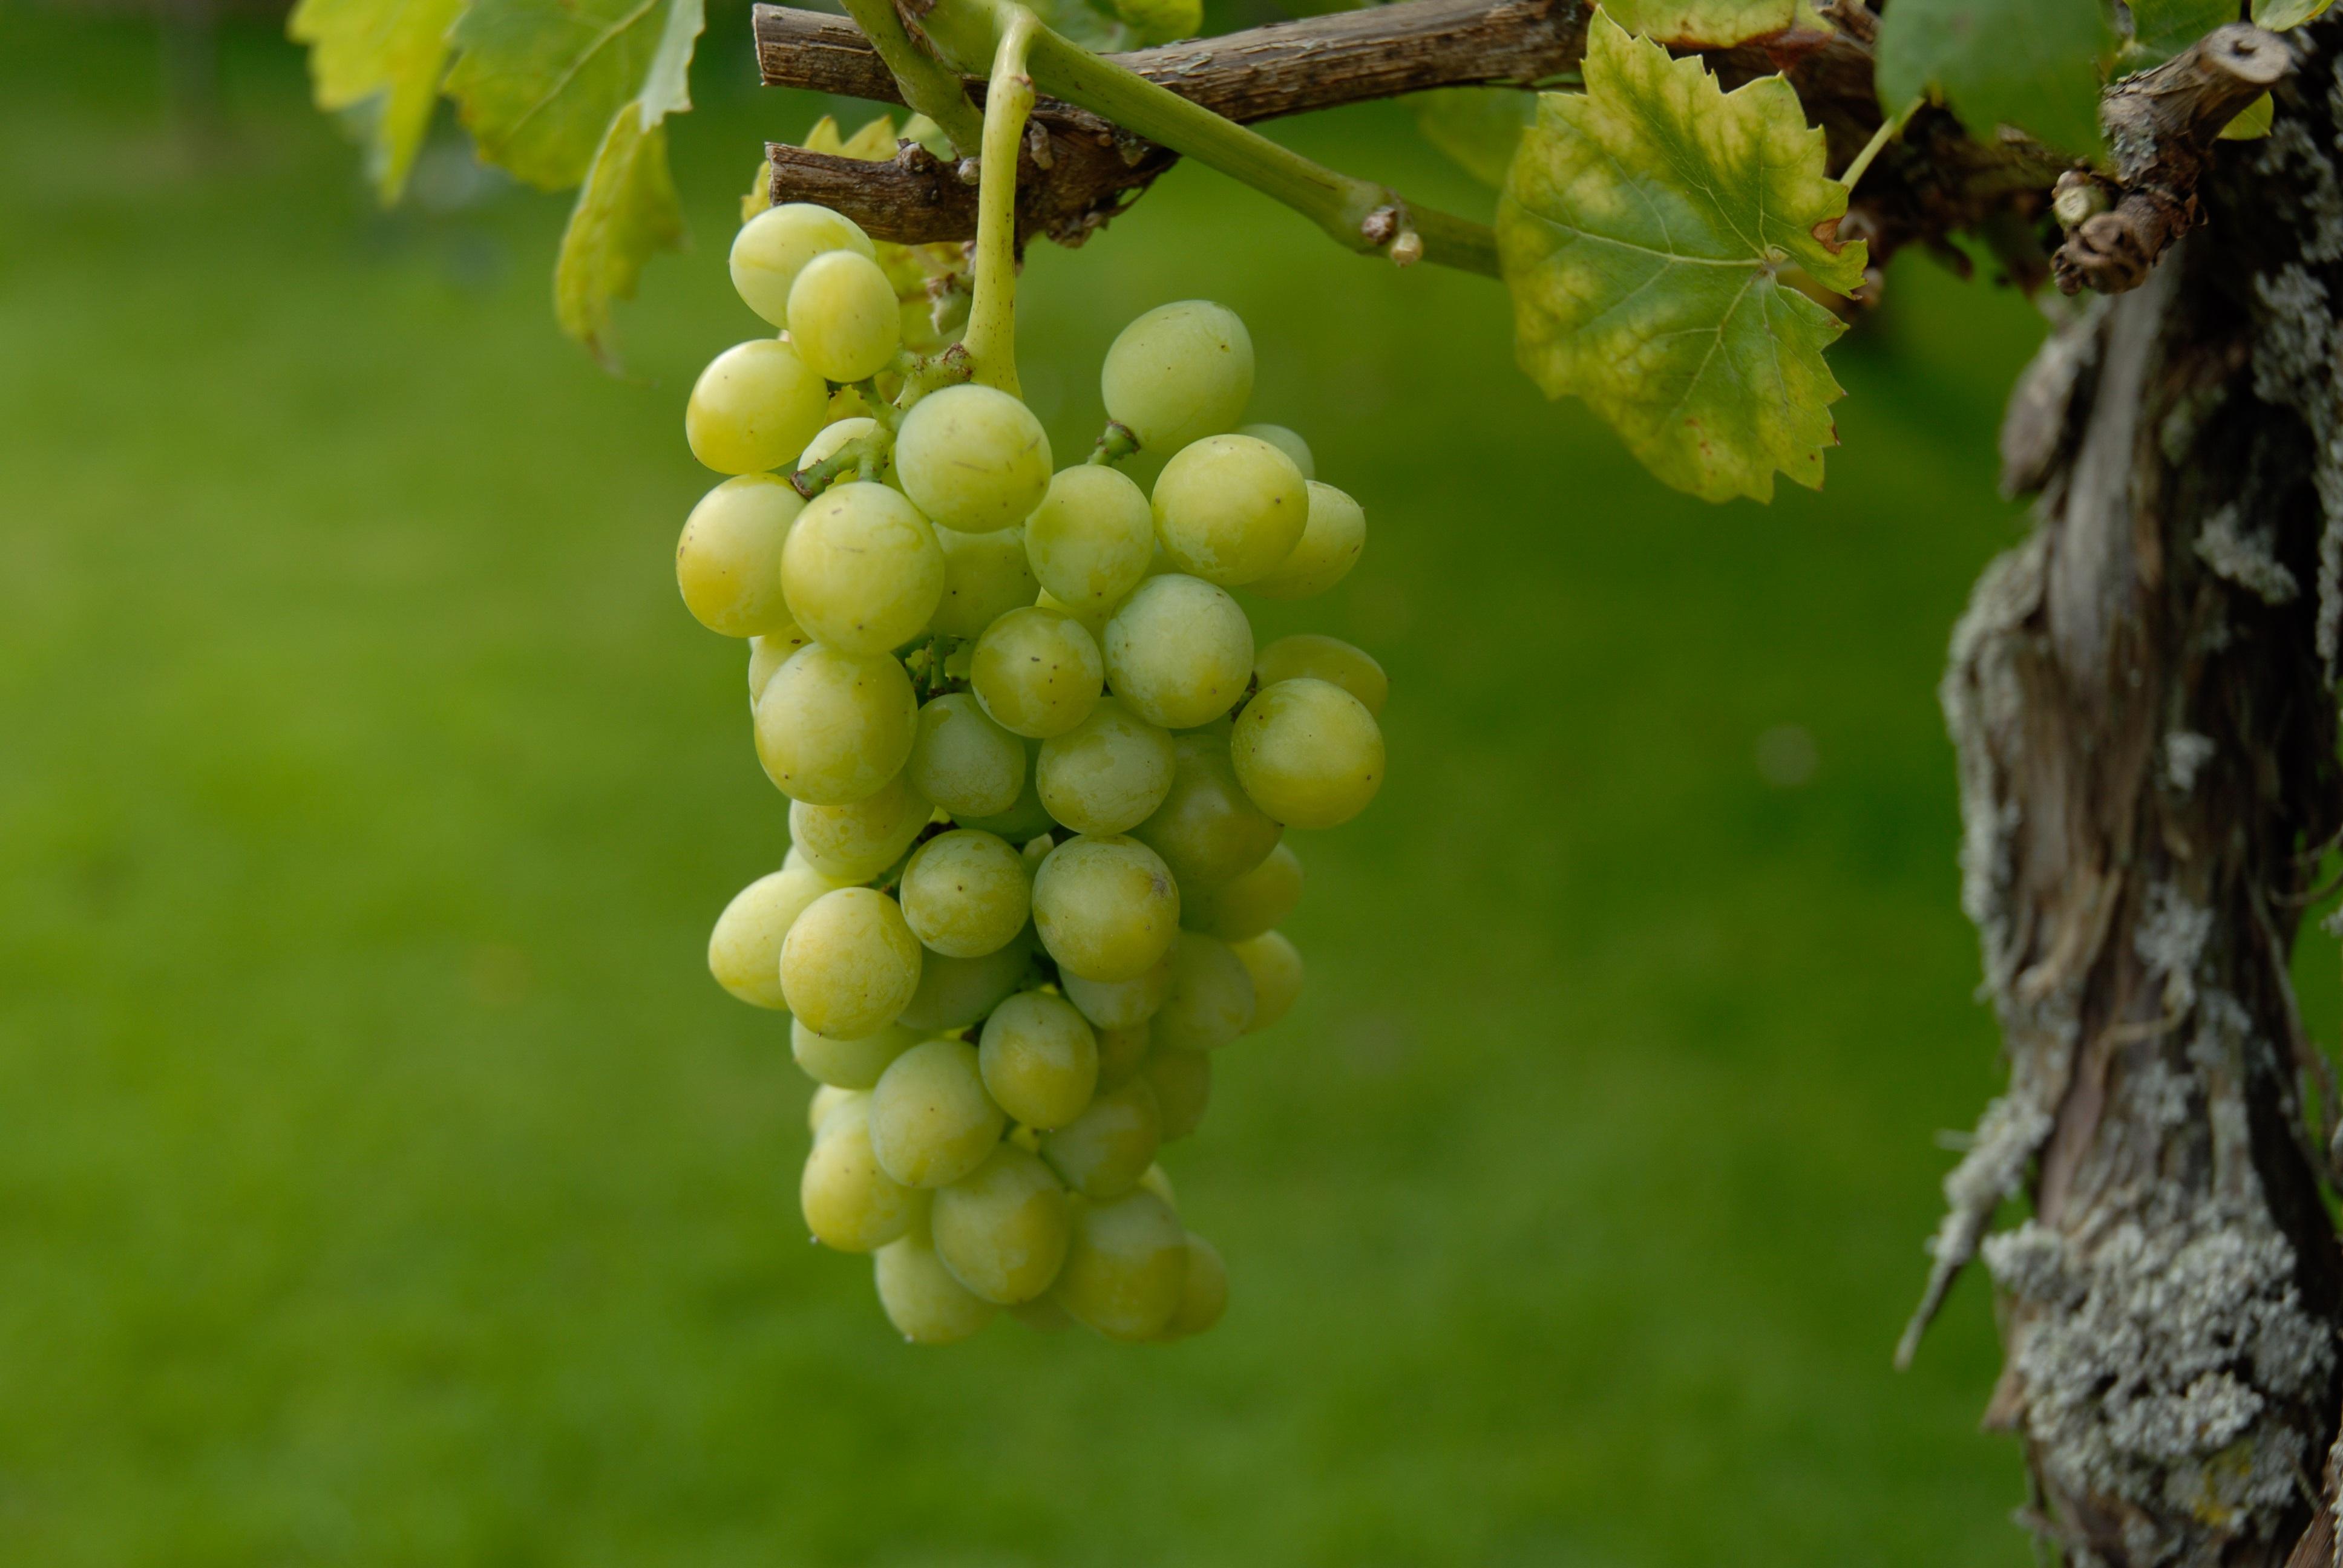 картинки зеленого винограда